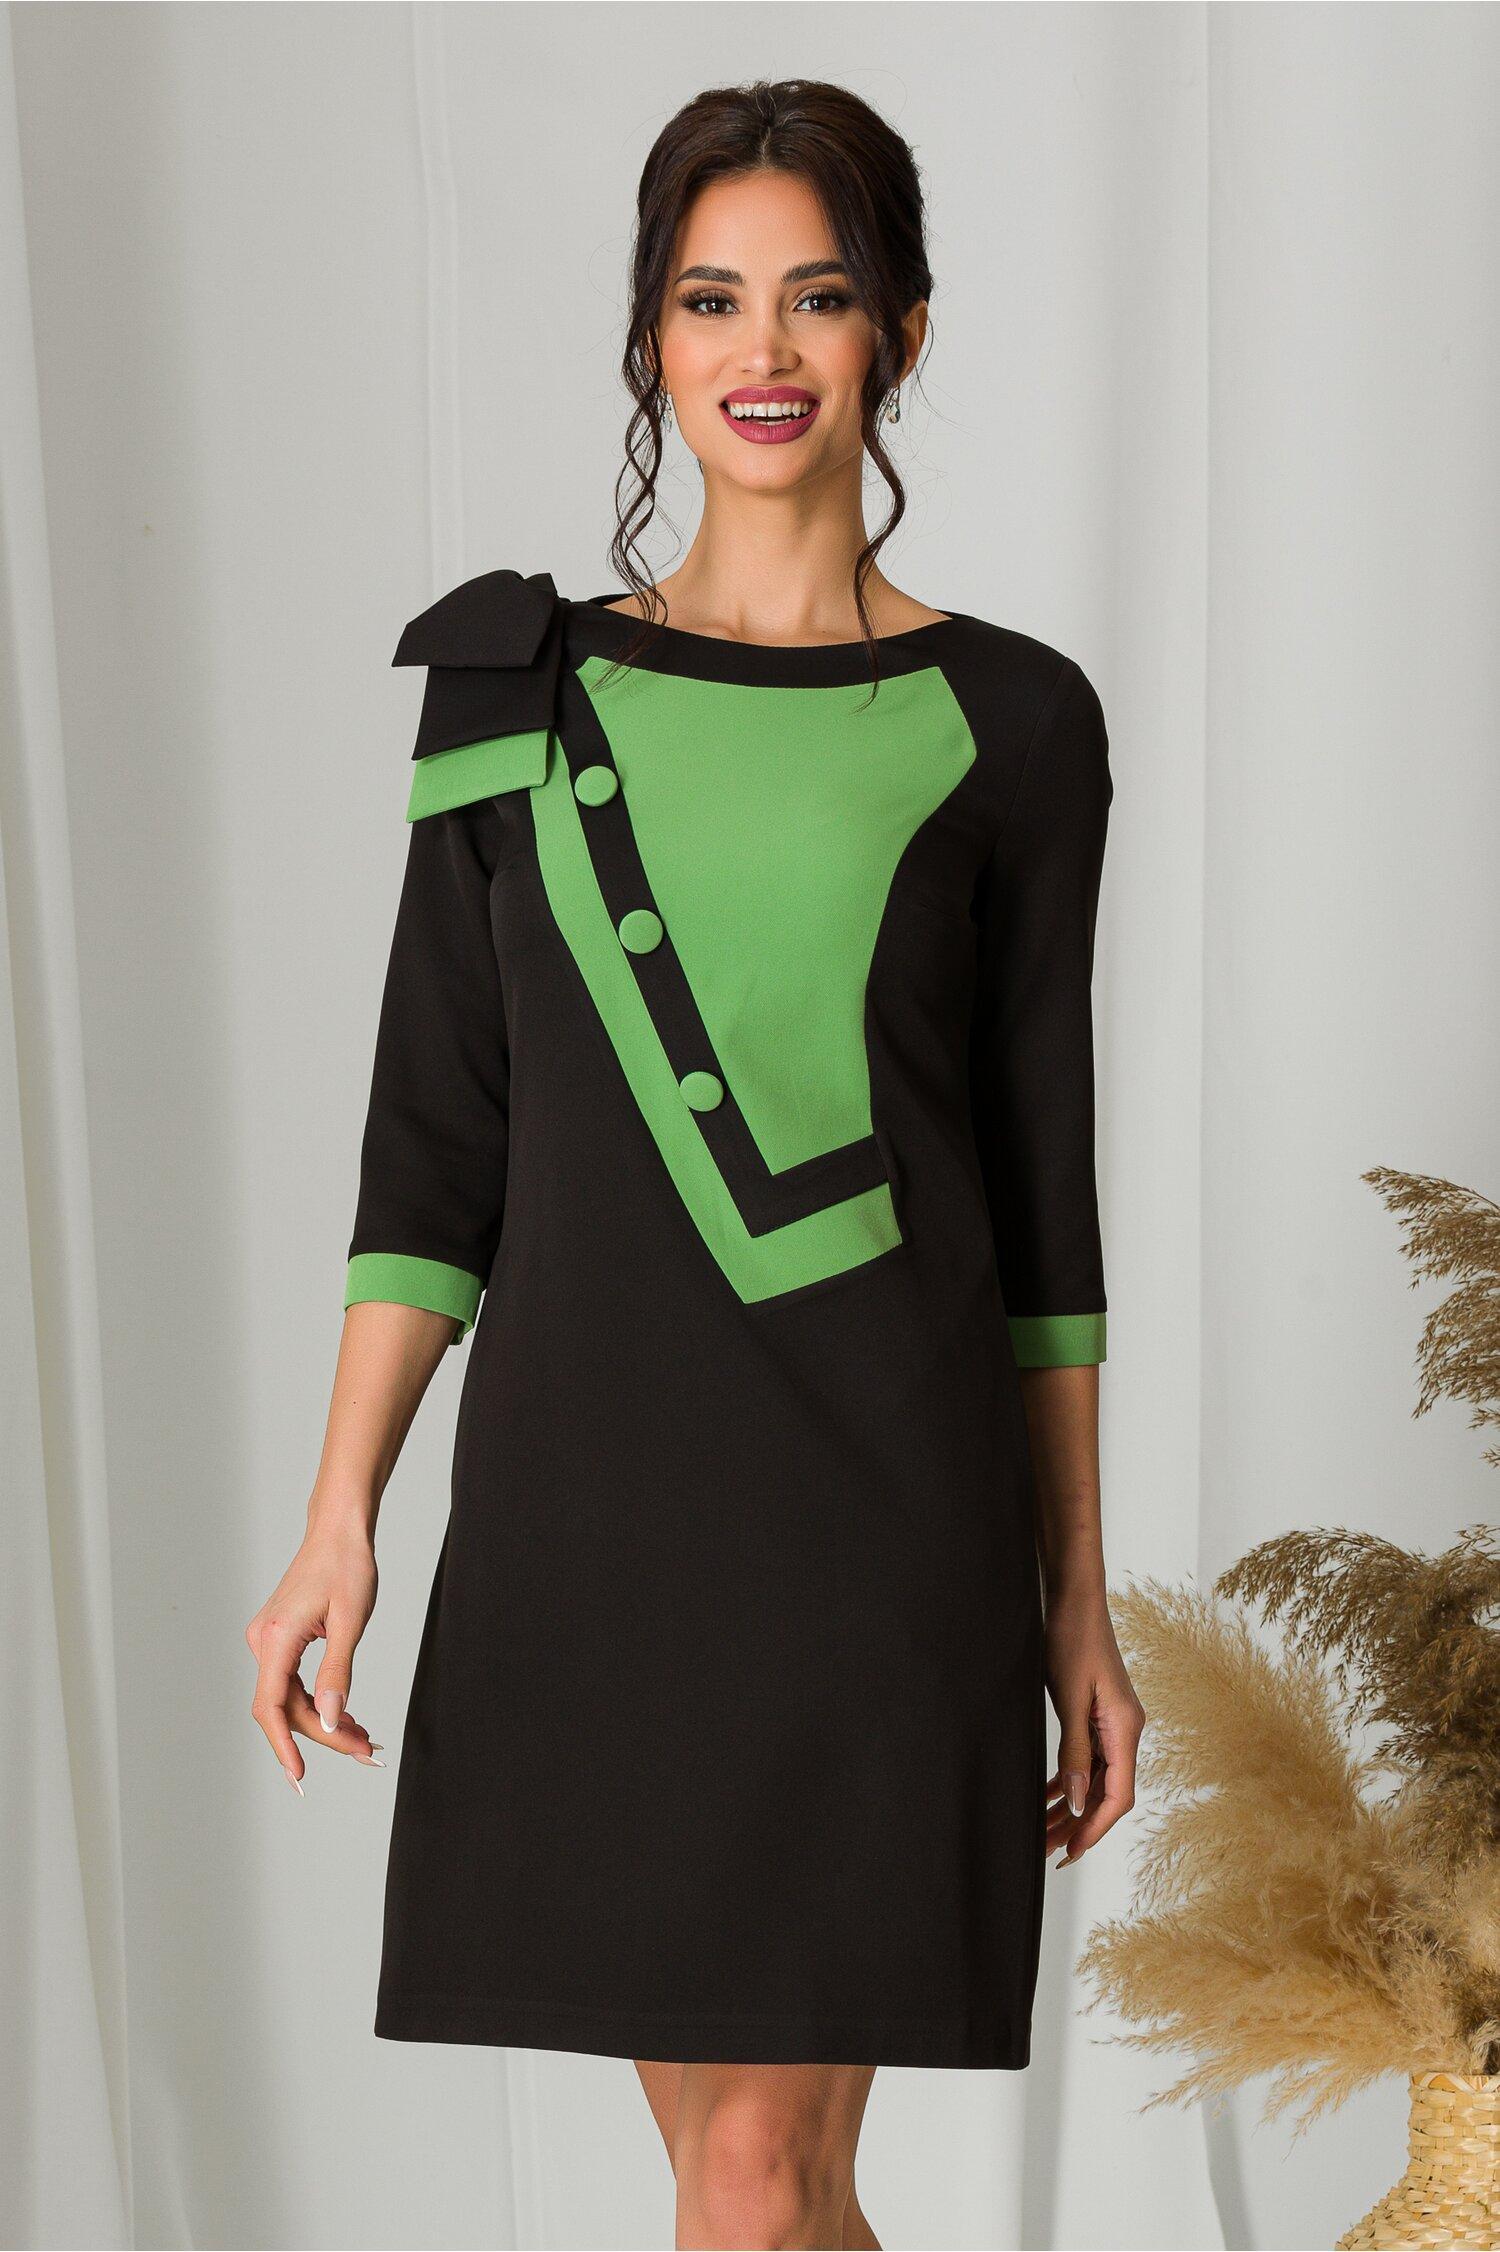 Rochie MBG neagra cu verde si fundita la umar